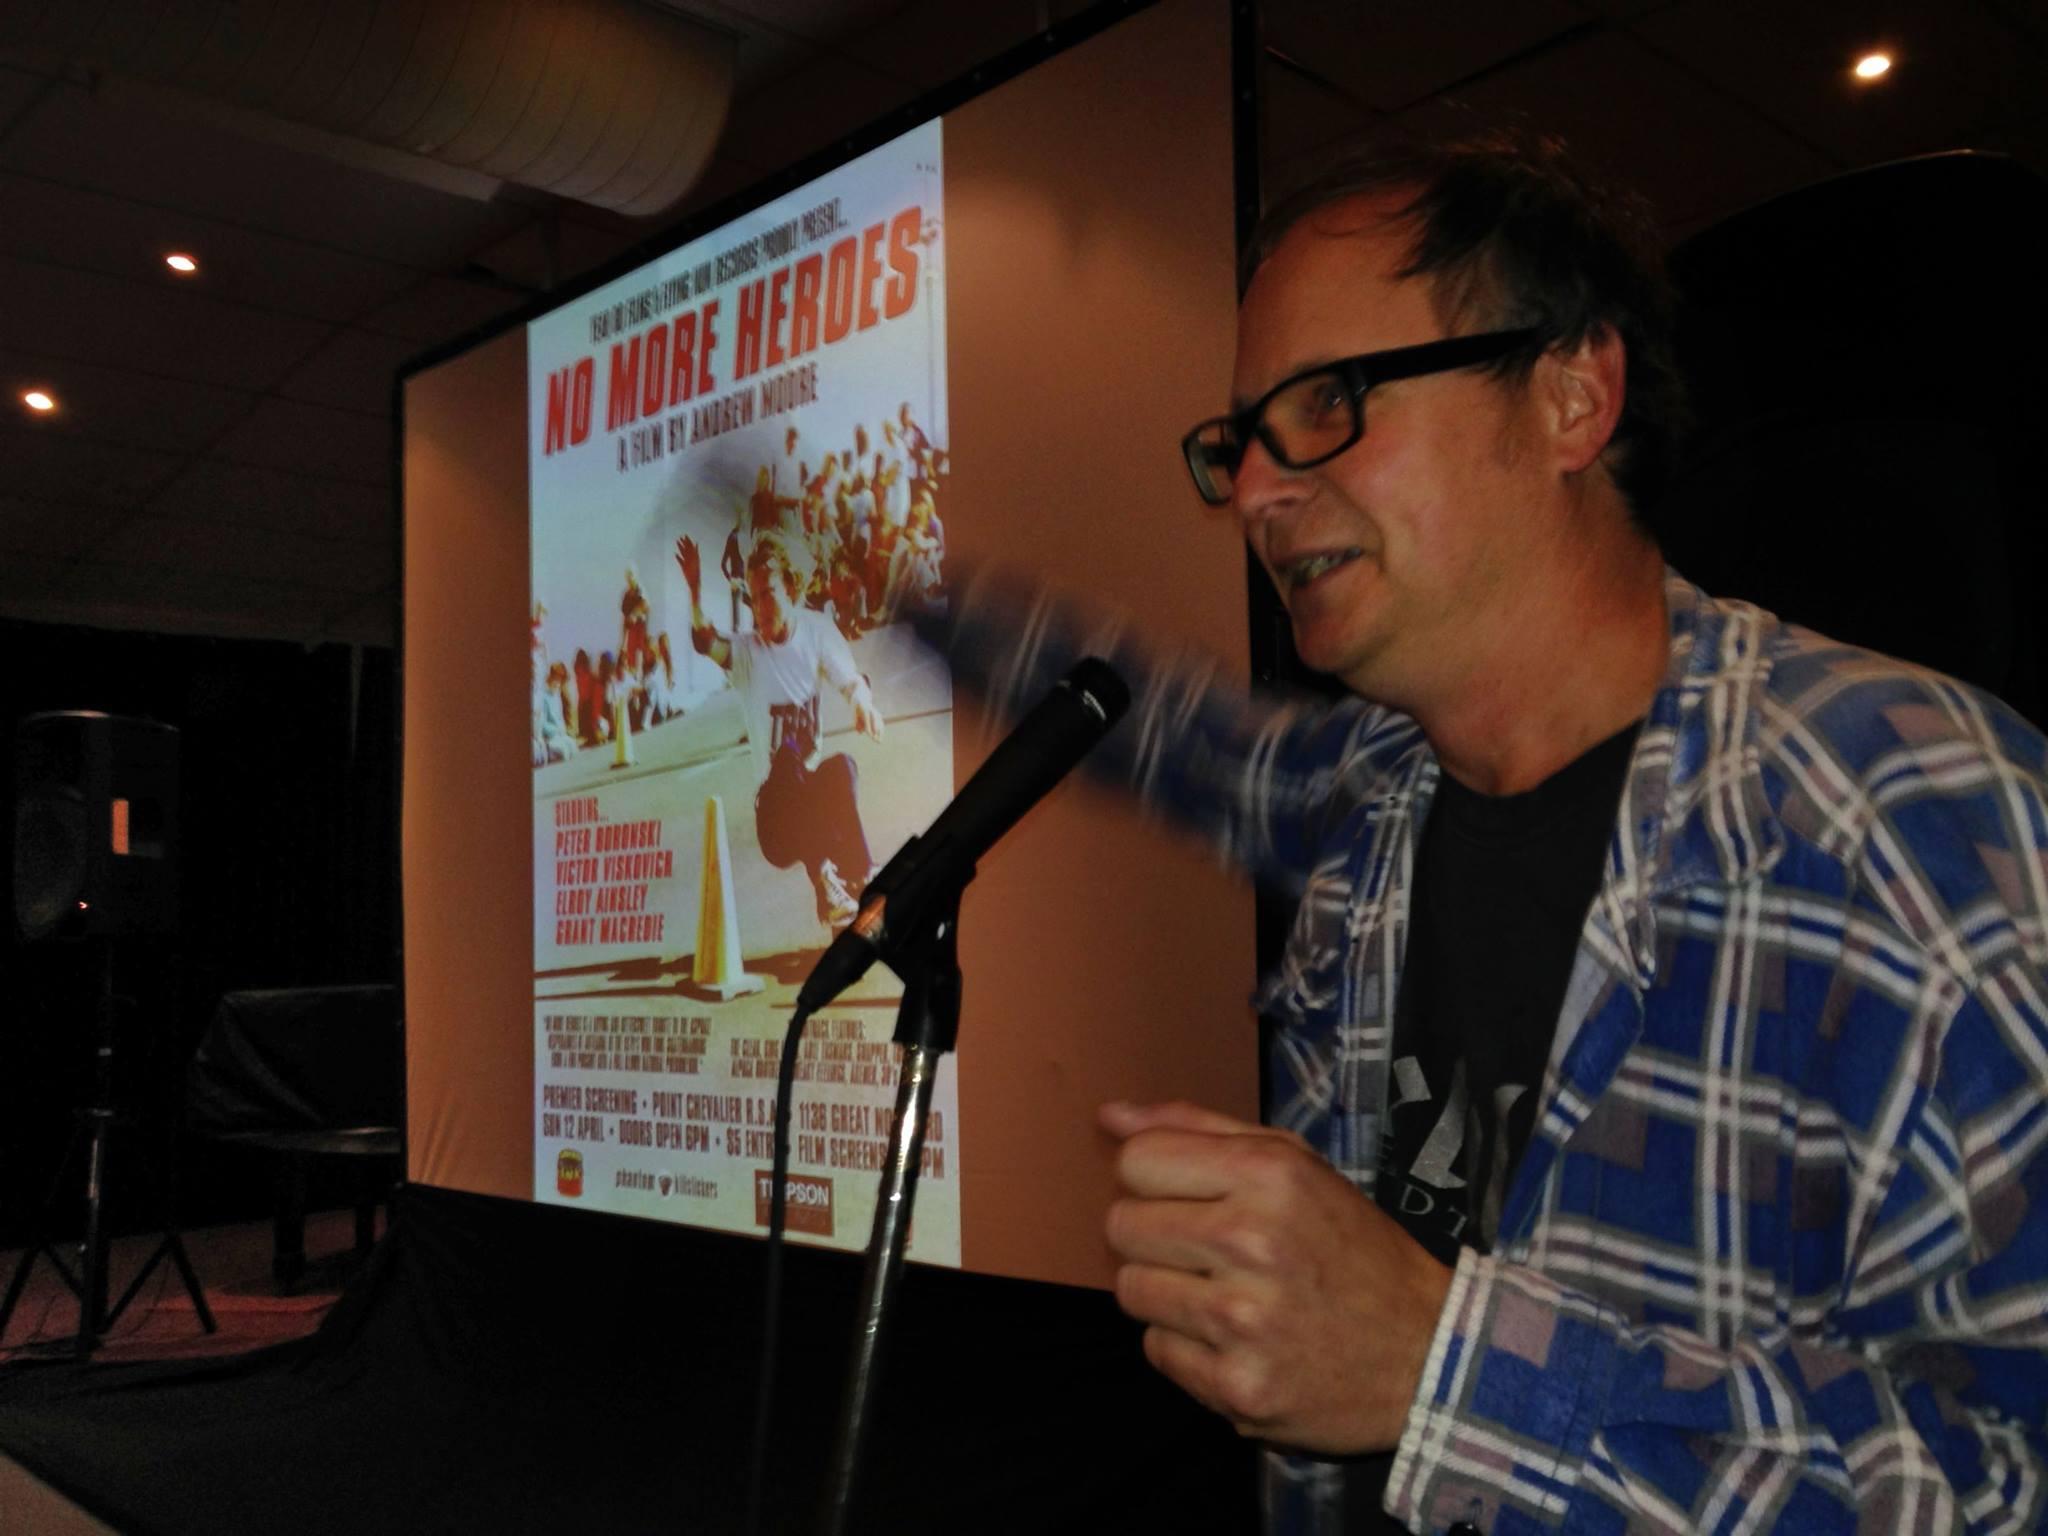 Andrew re-presenting seminal NZ Skate movie No More Heroes